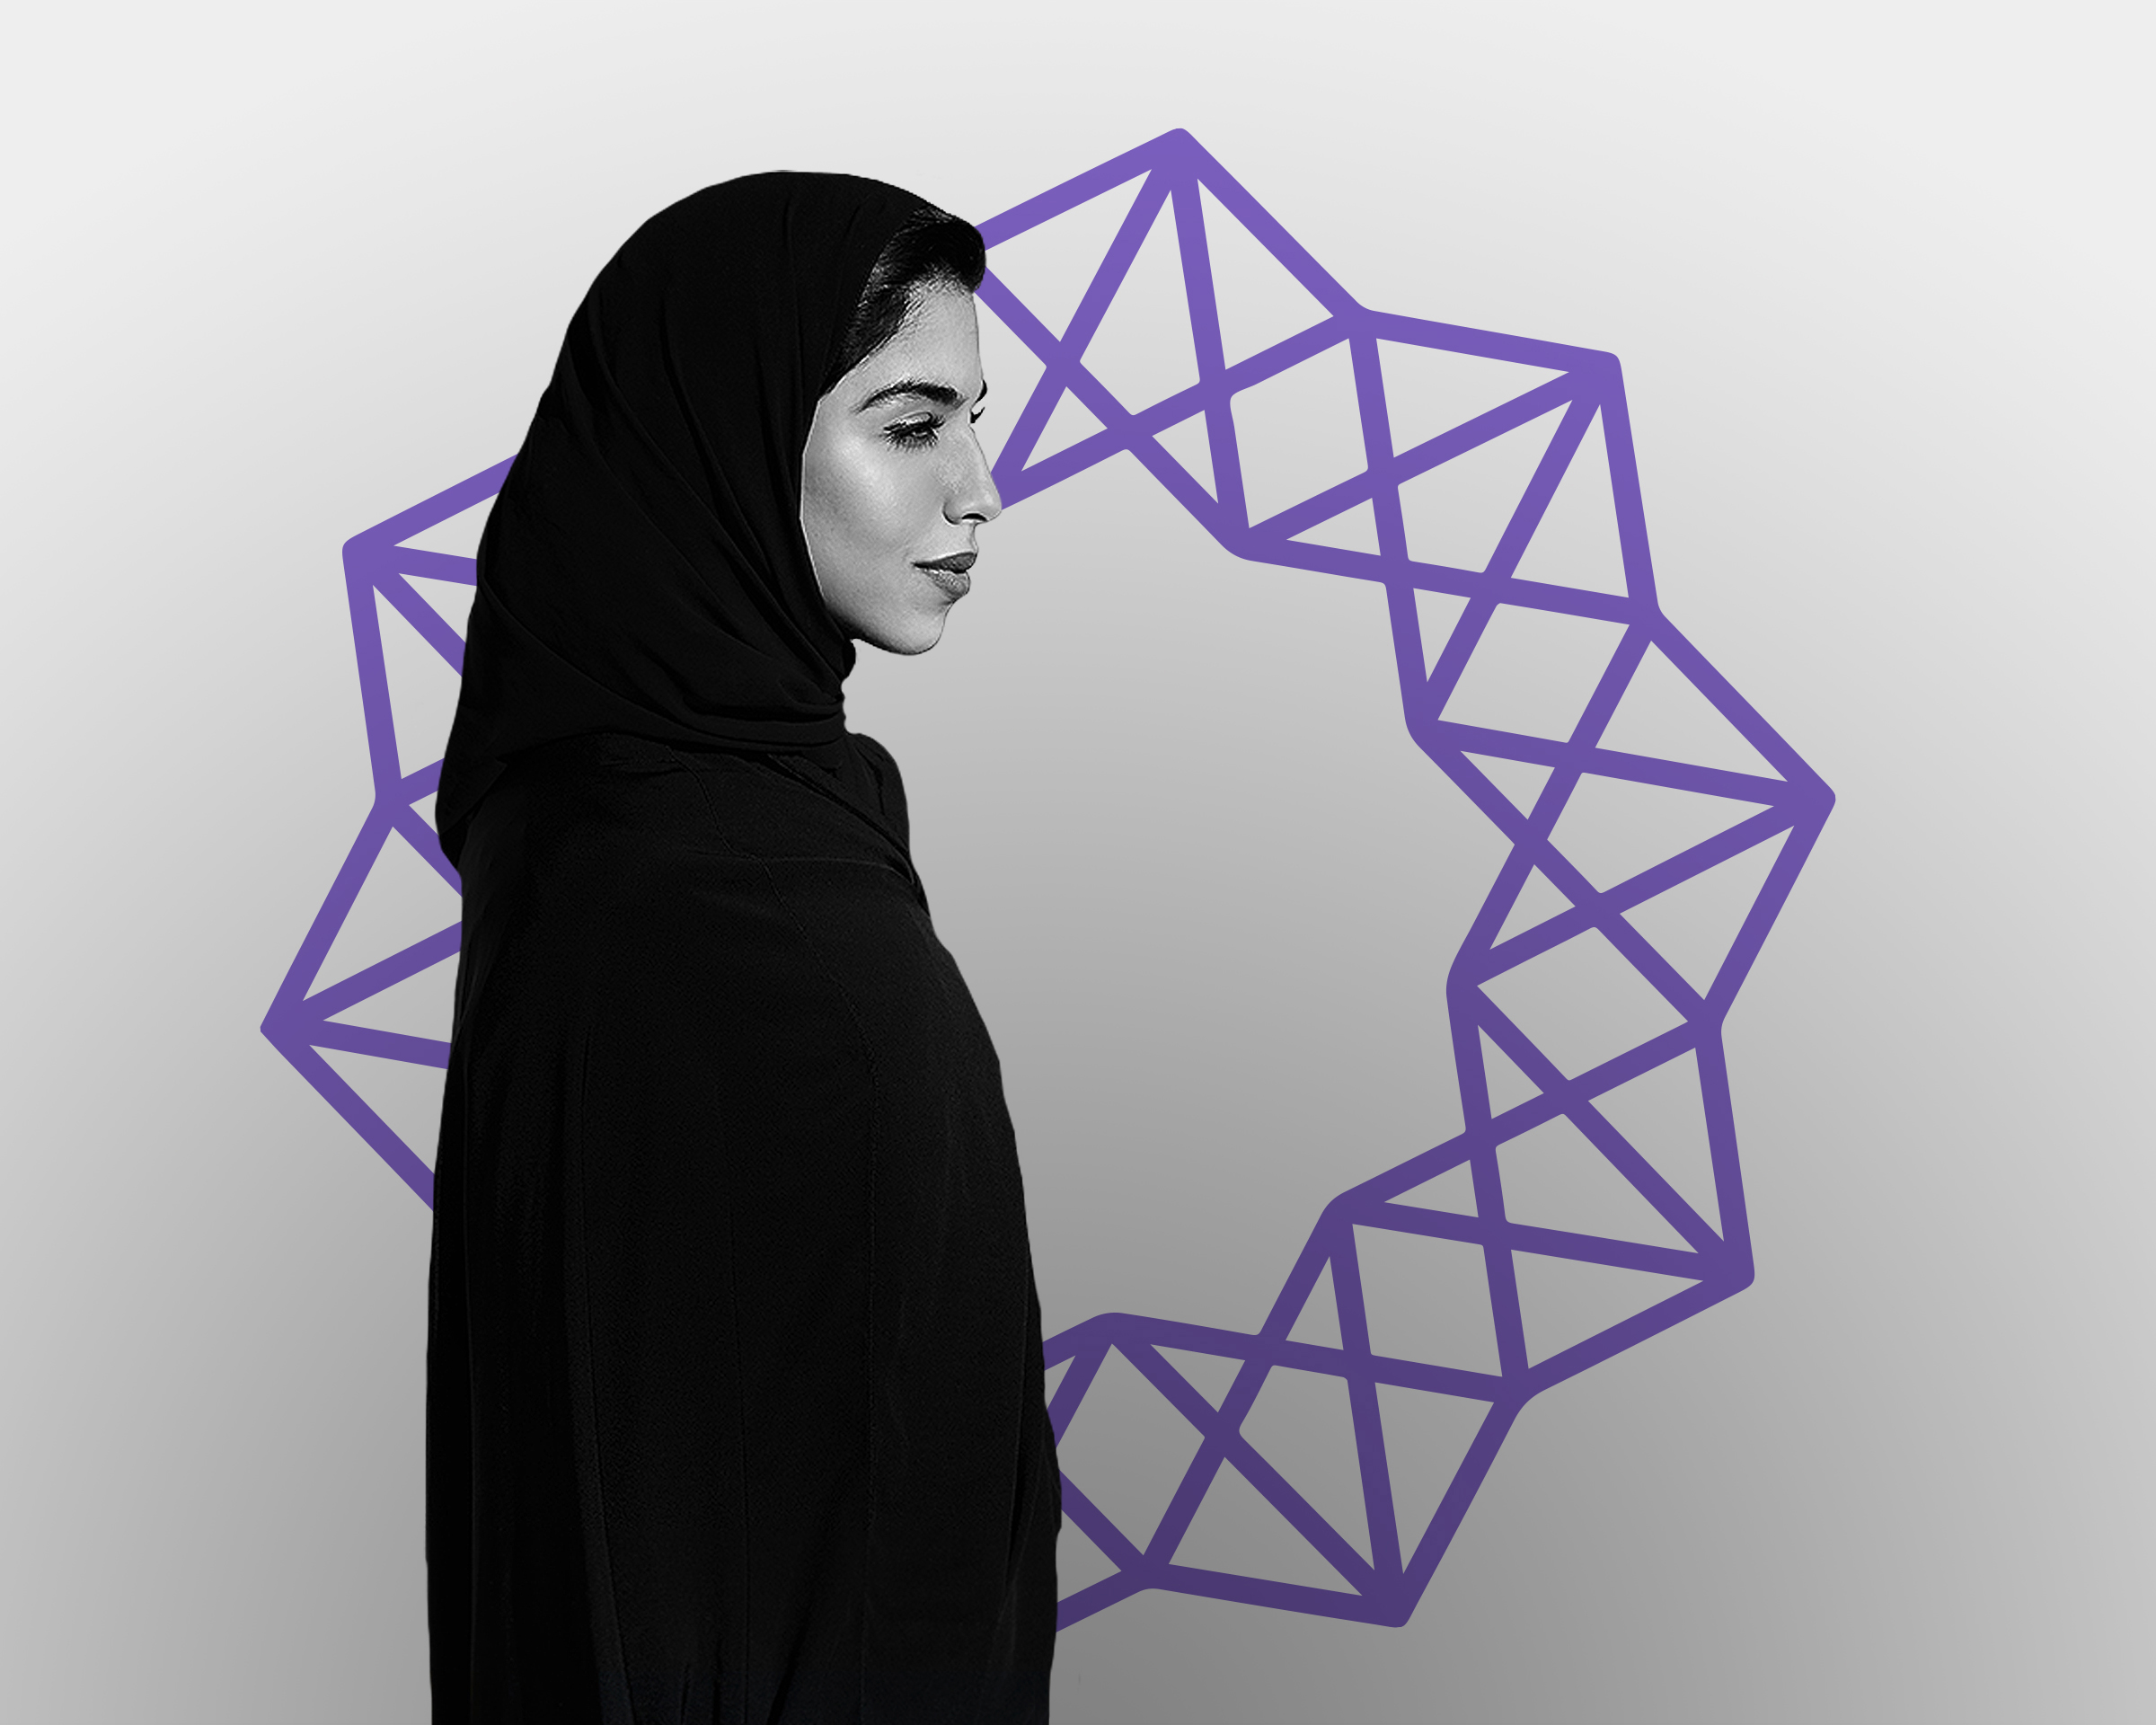 bouthayna al-muftah - 31 years oldArtist